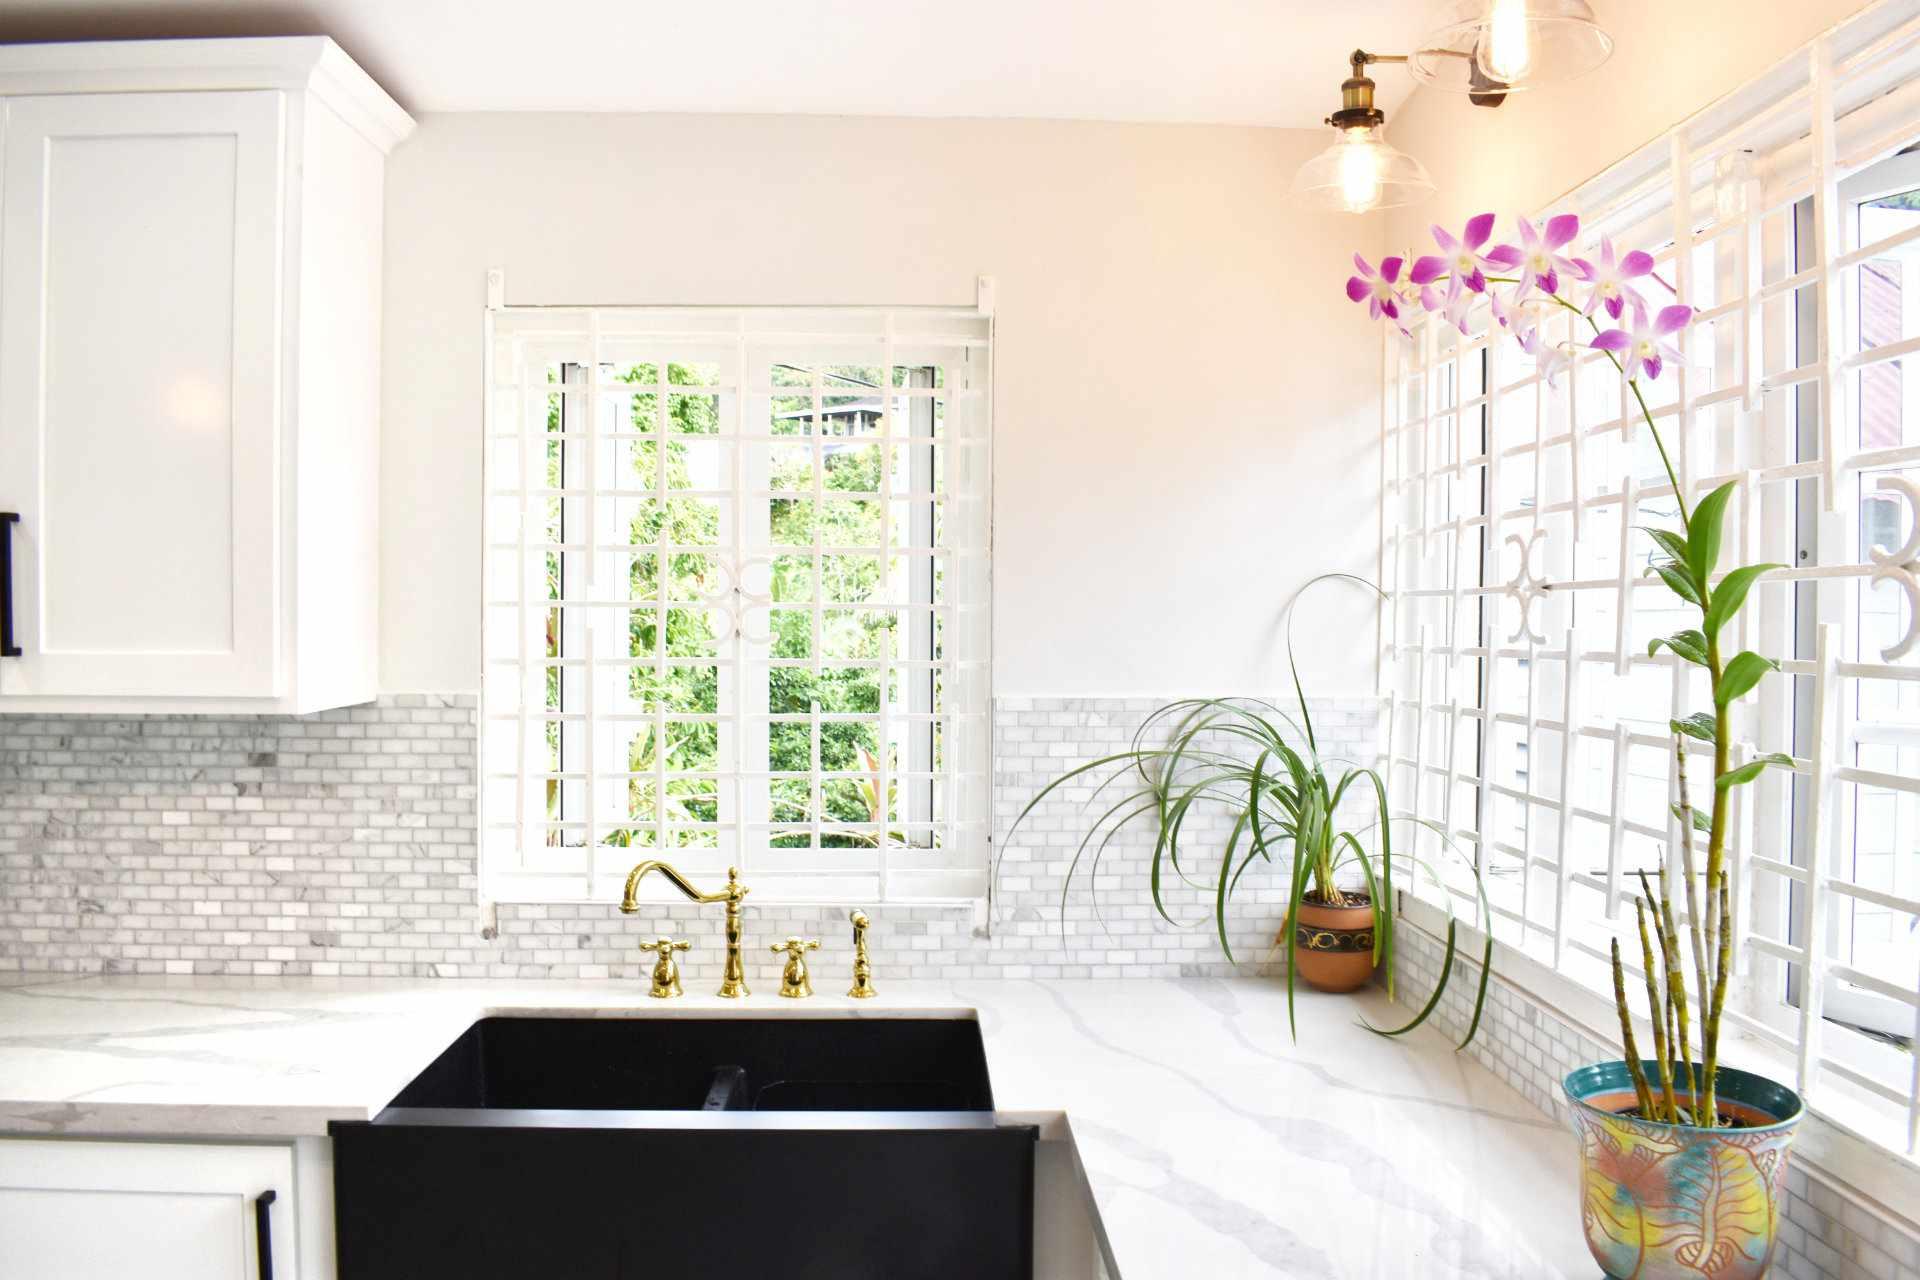 Gray backsplash tiles